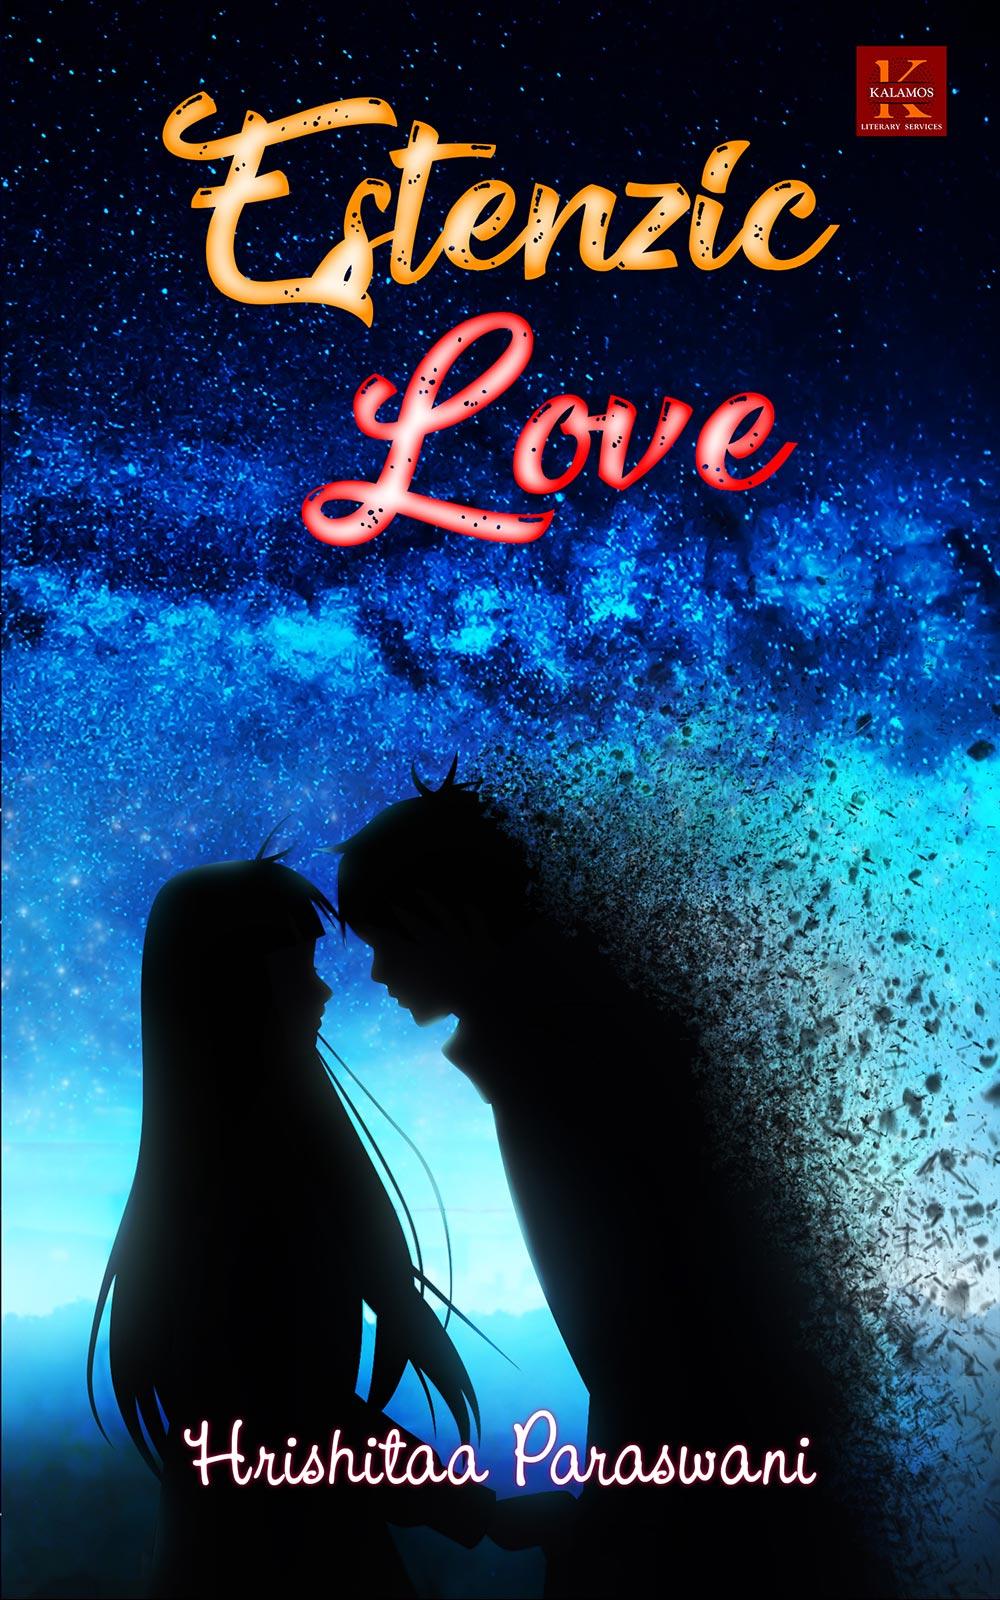 Estenzic Love By Hrishitaa Paraswani